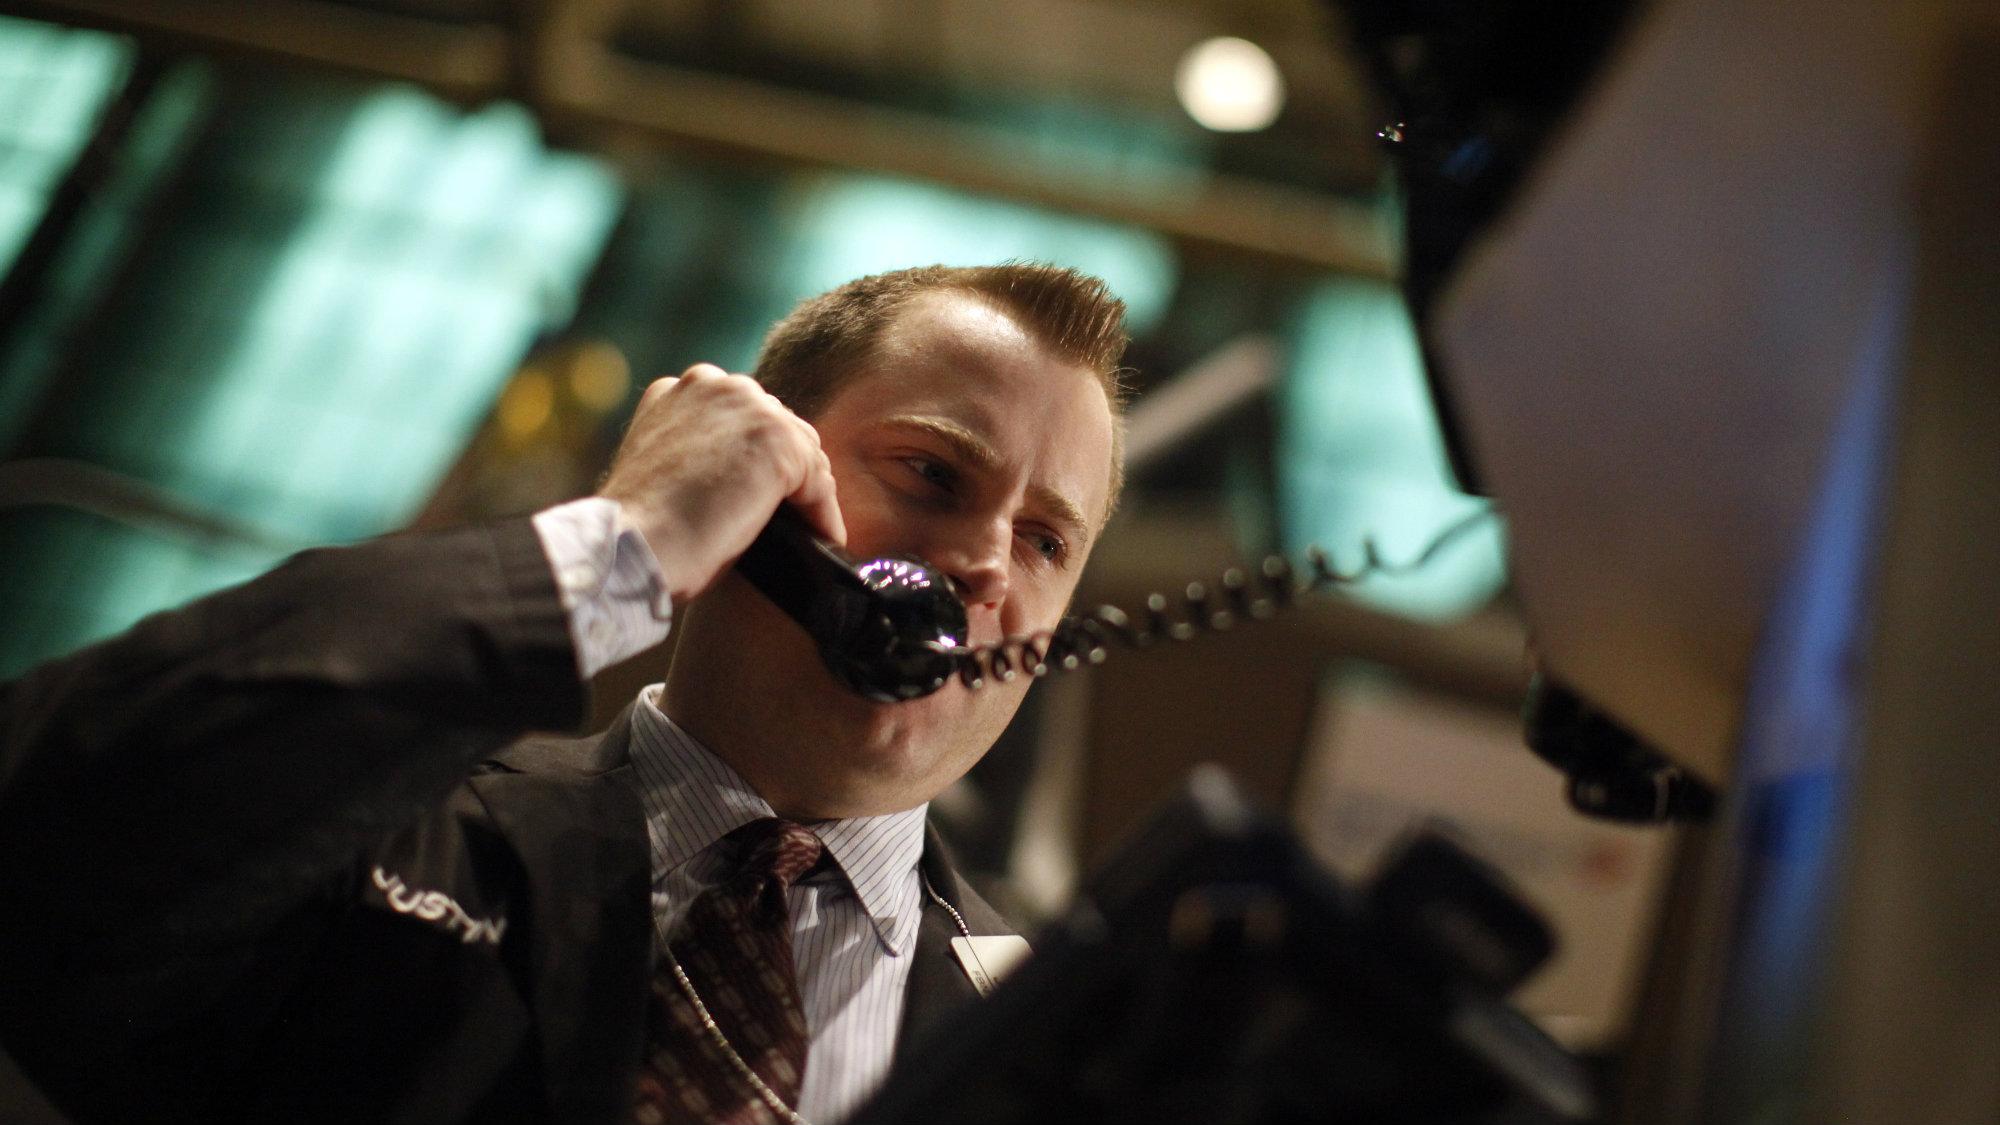 A businessman on the phone